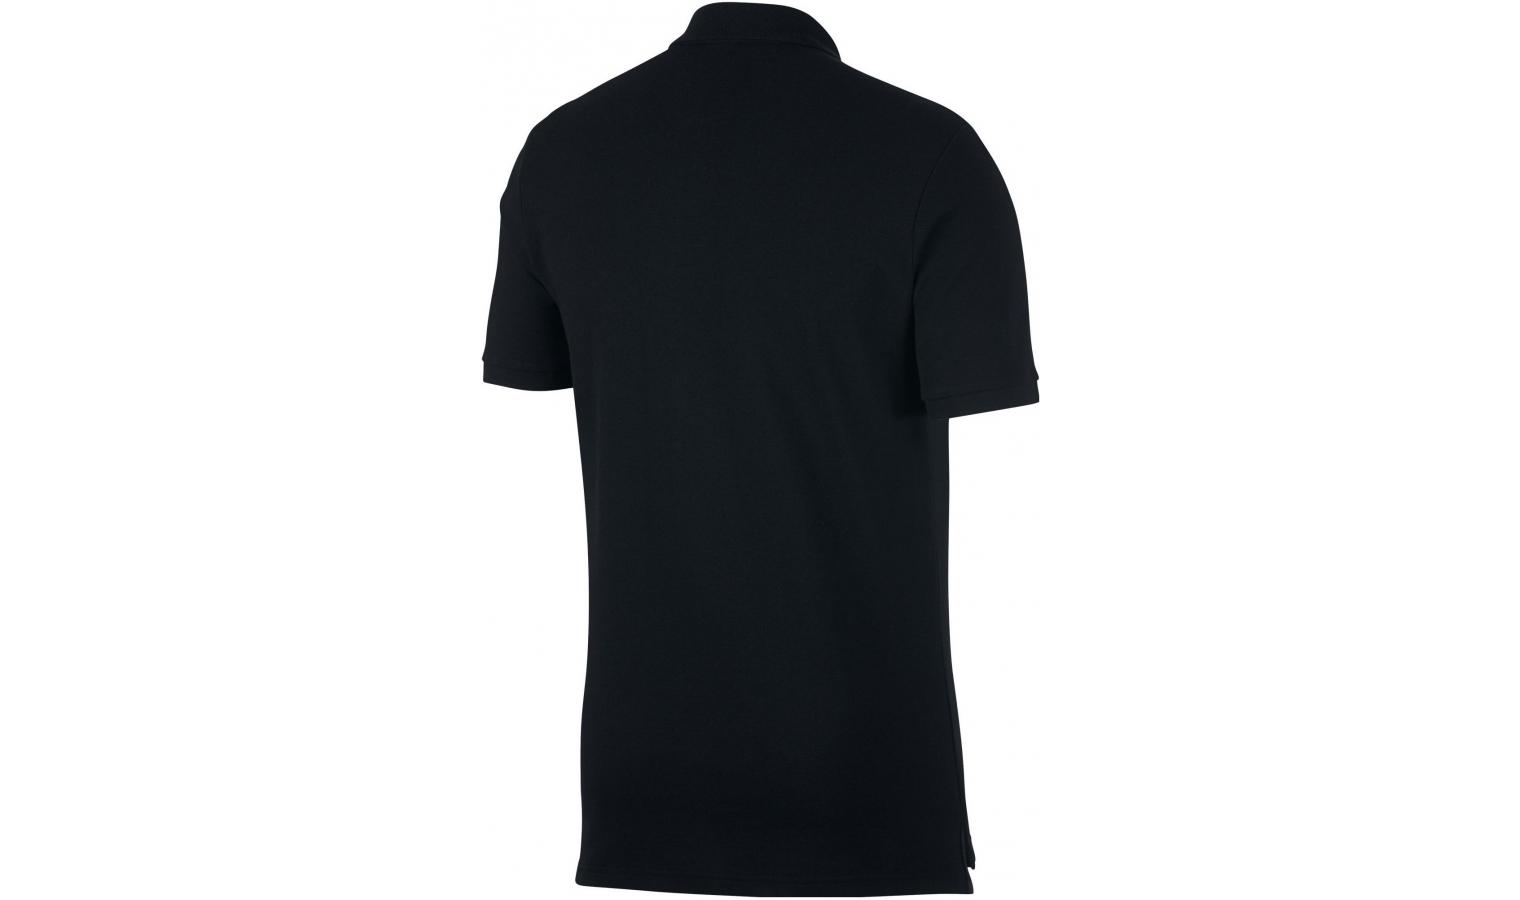 Pánské tričko Nike NSW POLO MATCHUP PQ černé  b1369af398f